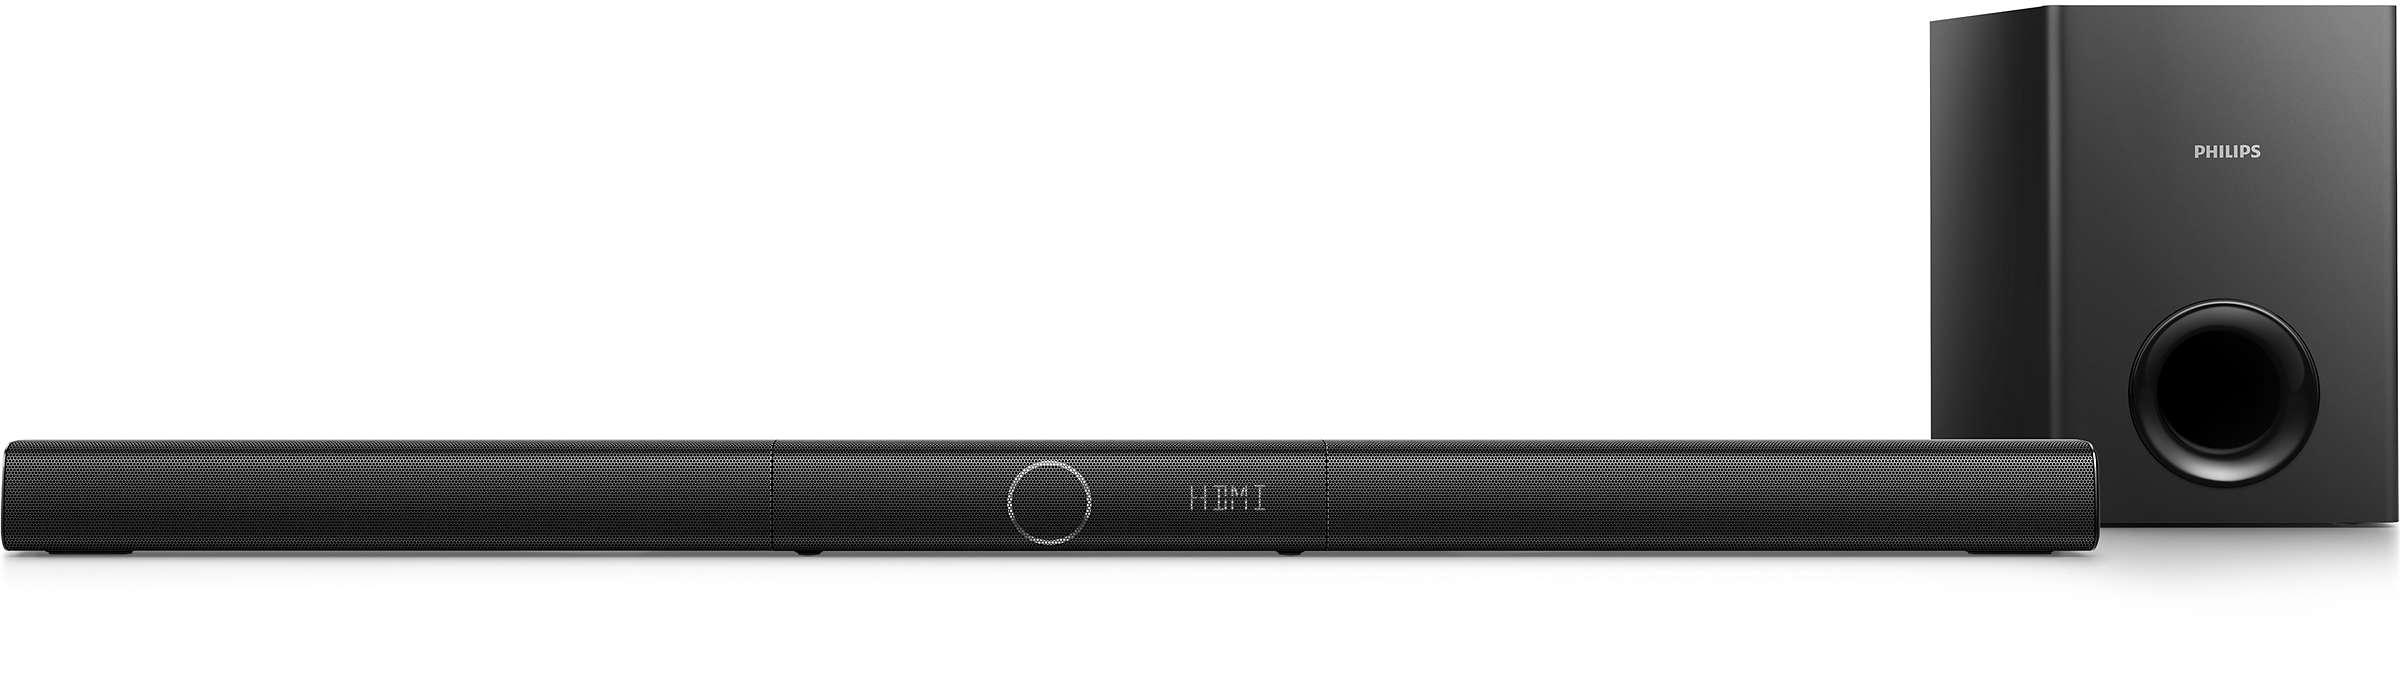 Bluetooth akışı ile 3.1 Ch'den